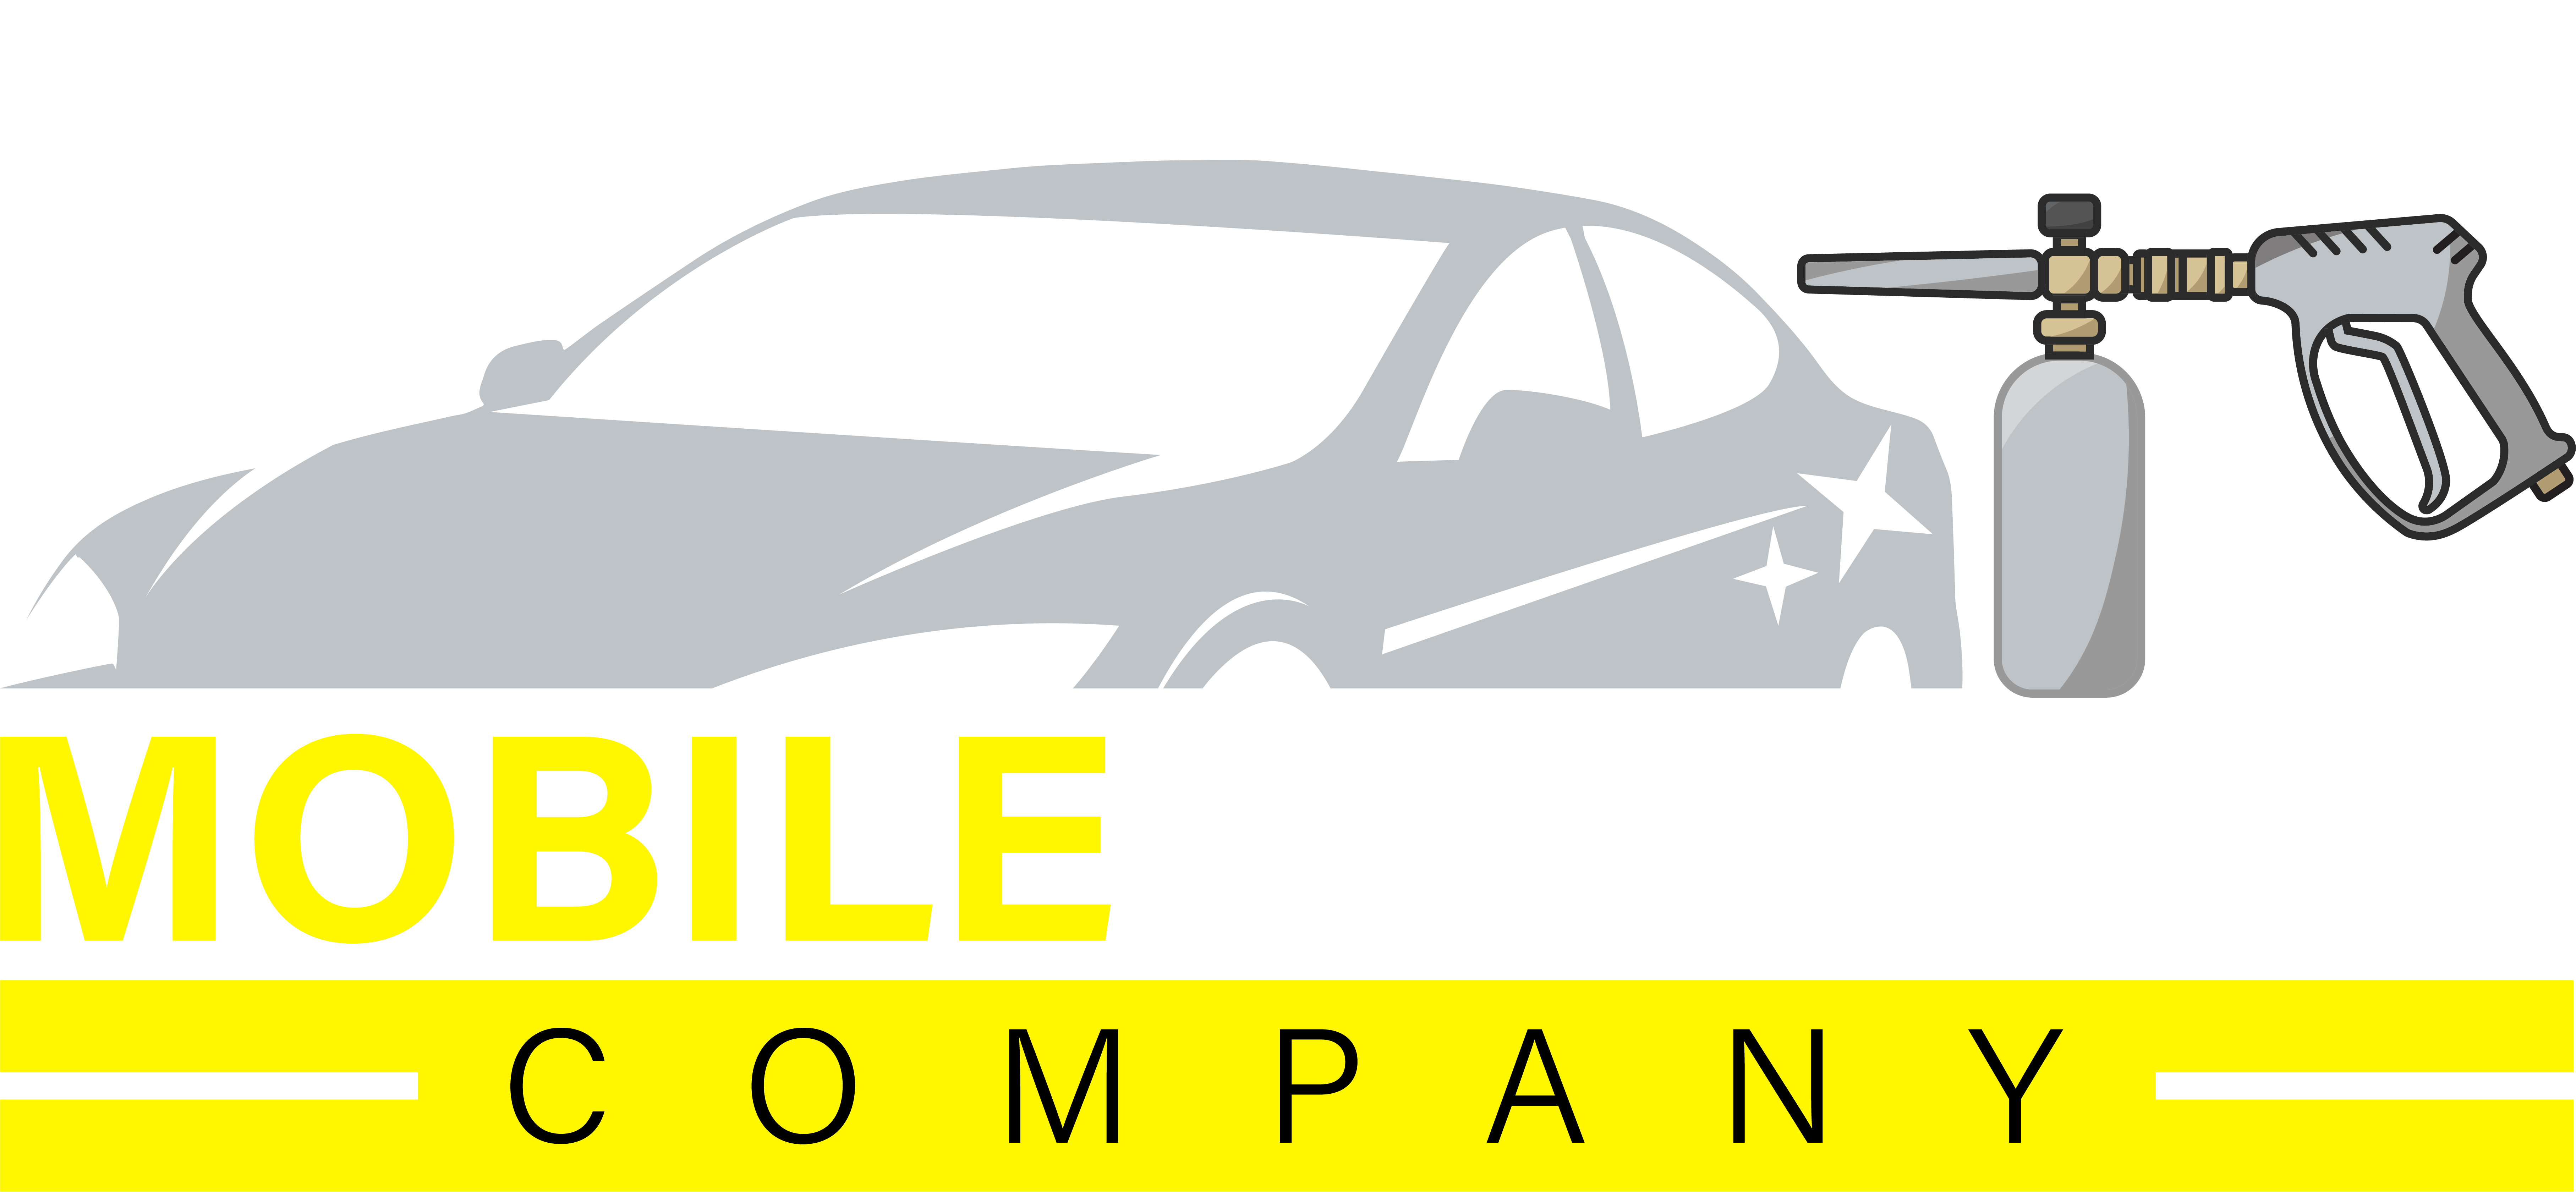 Mobile Car Valeting Company